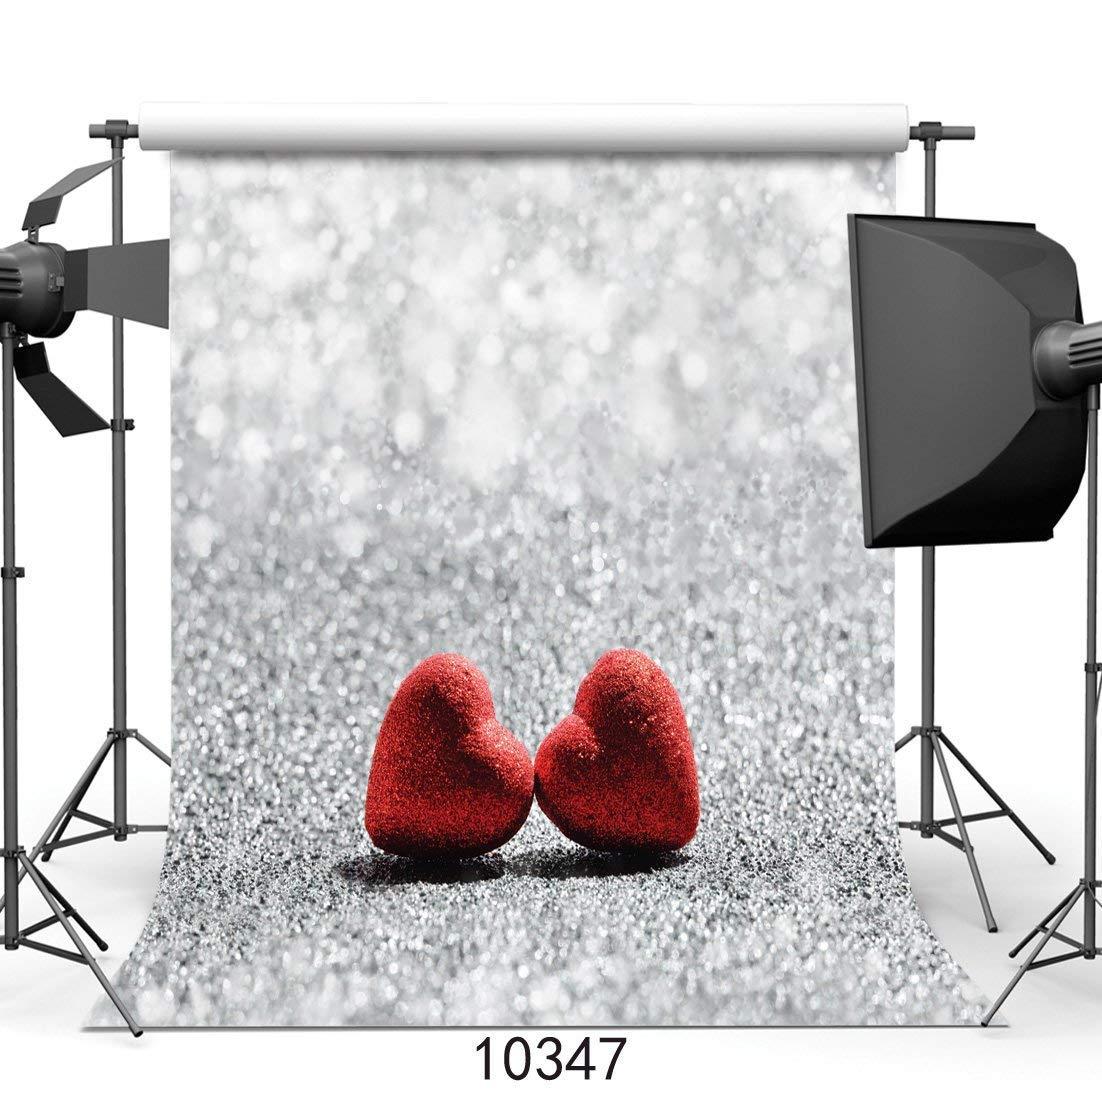 SZZWY 10x10フィート バレンタインデービニール写真背景 カスタマイズ写真背景スタジオ小道具 JLT10347   B07L5R97FG